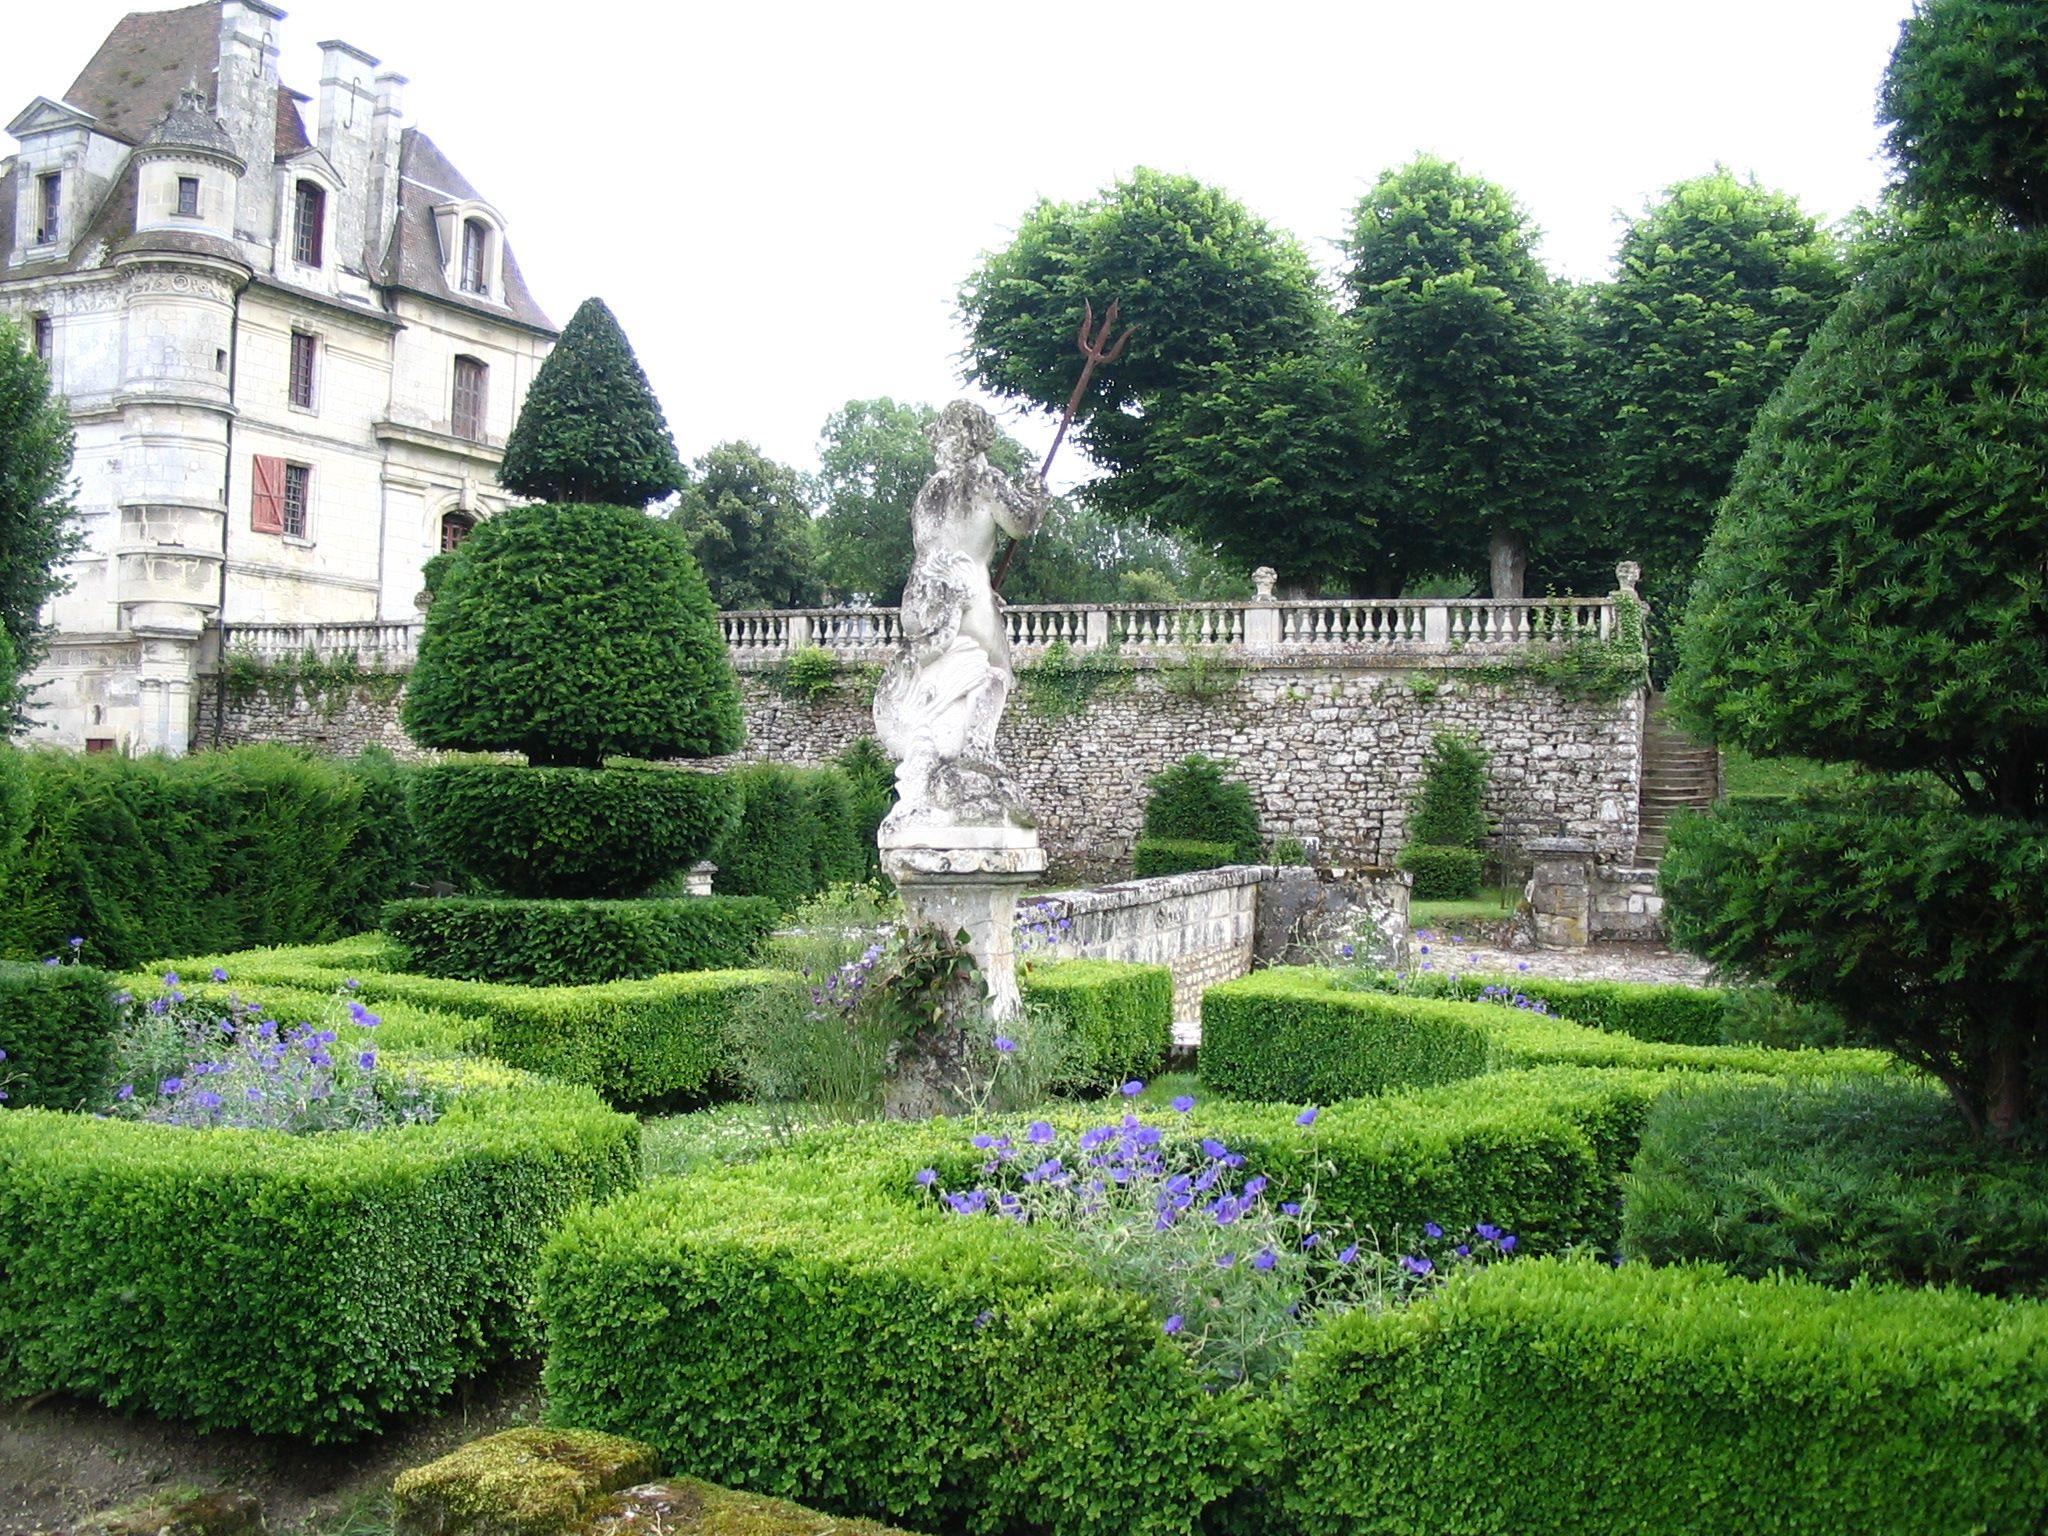 Gardens Of The French Renaissance French Garden Garden Inspiration Country Gardening